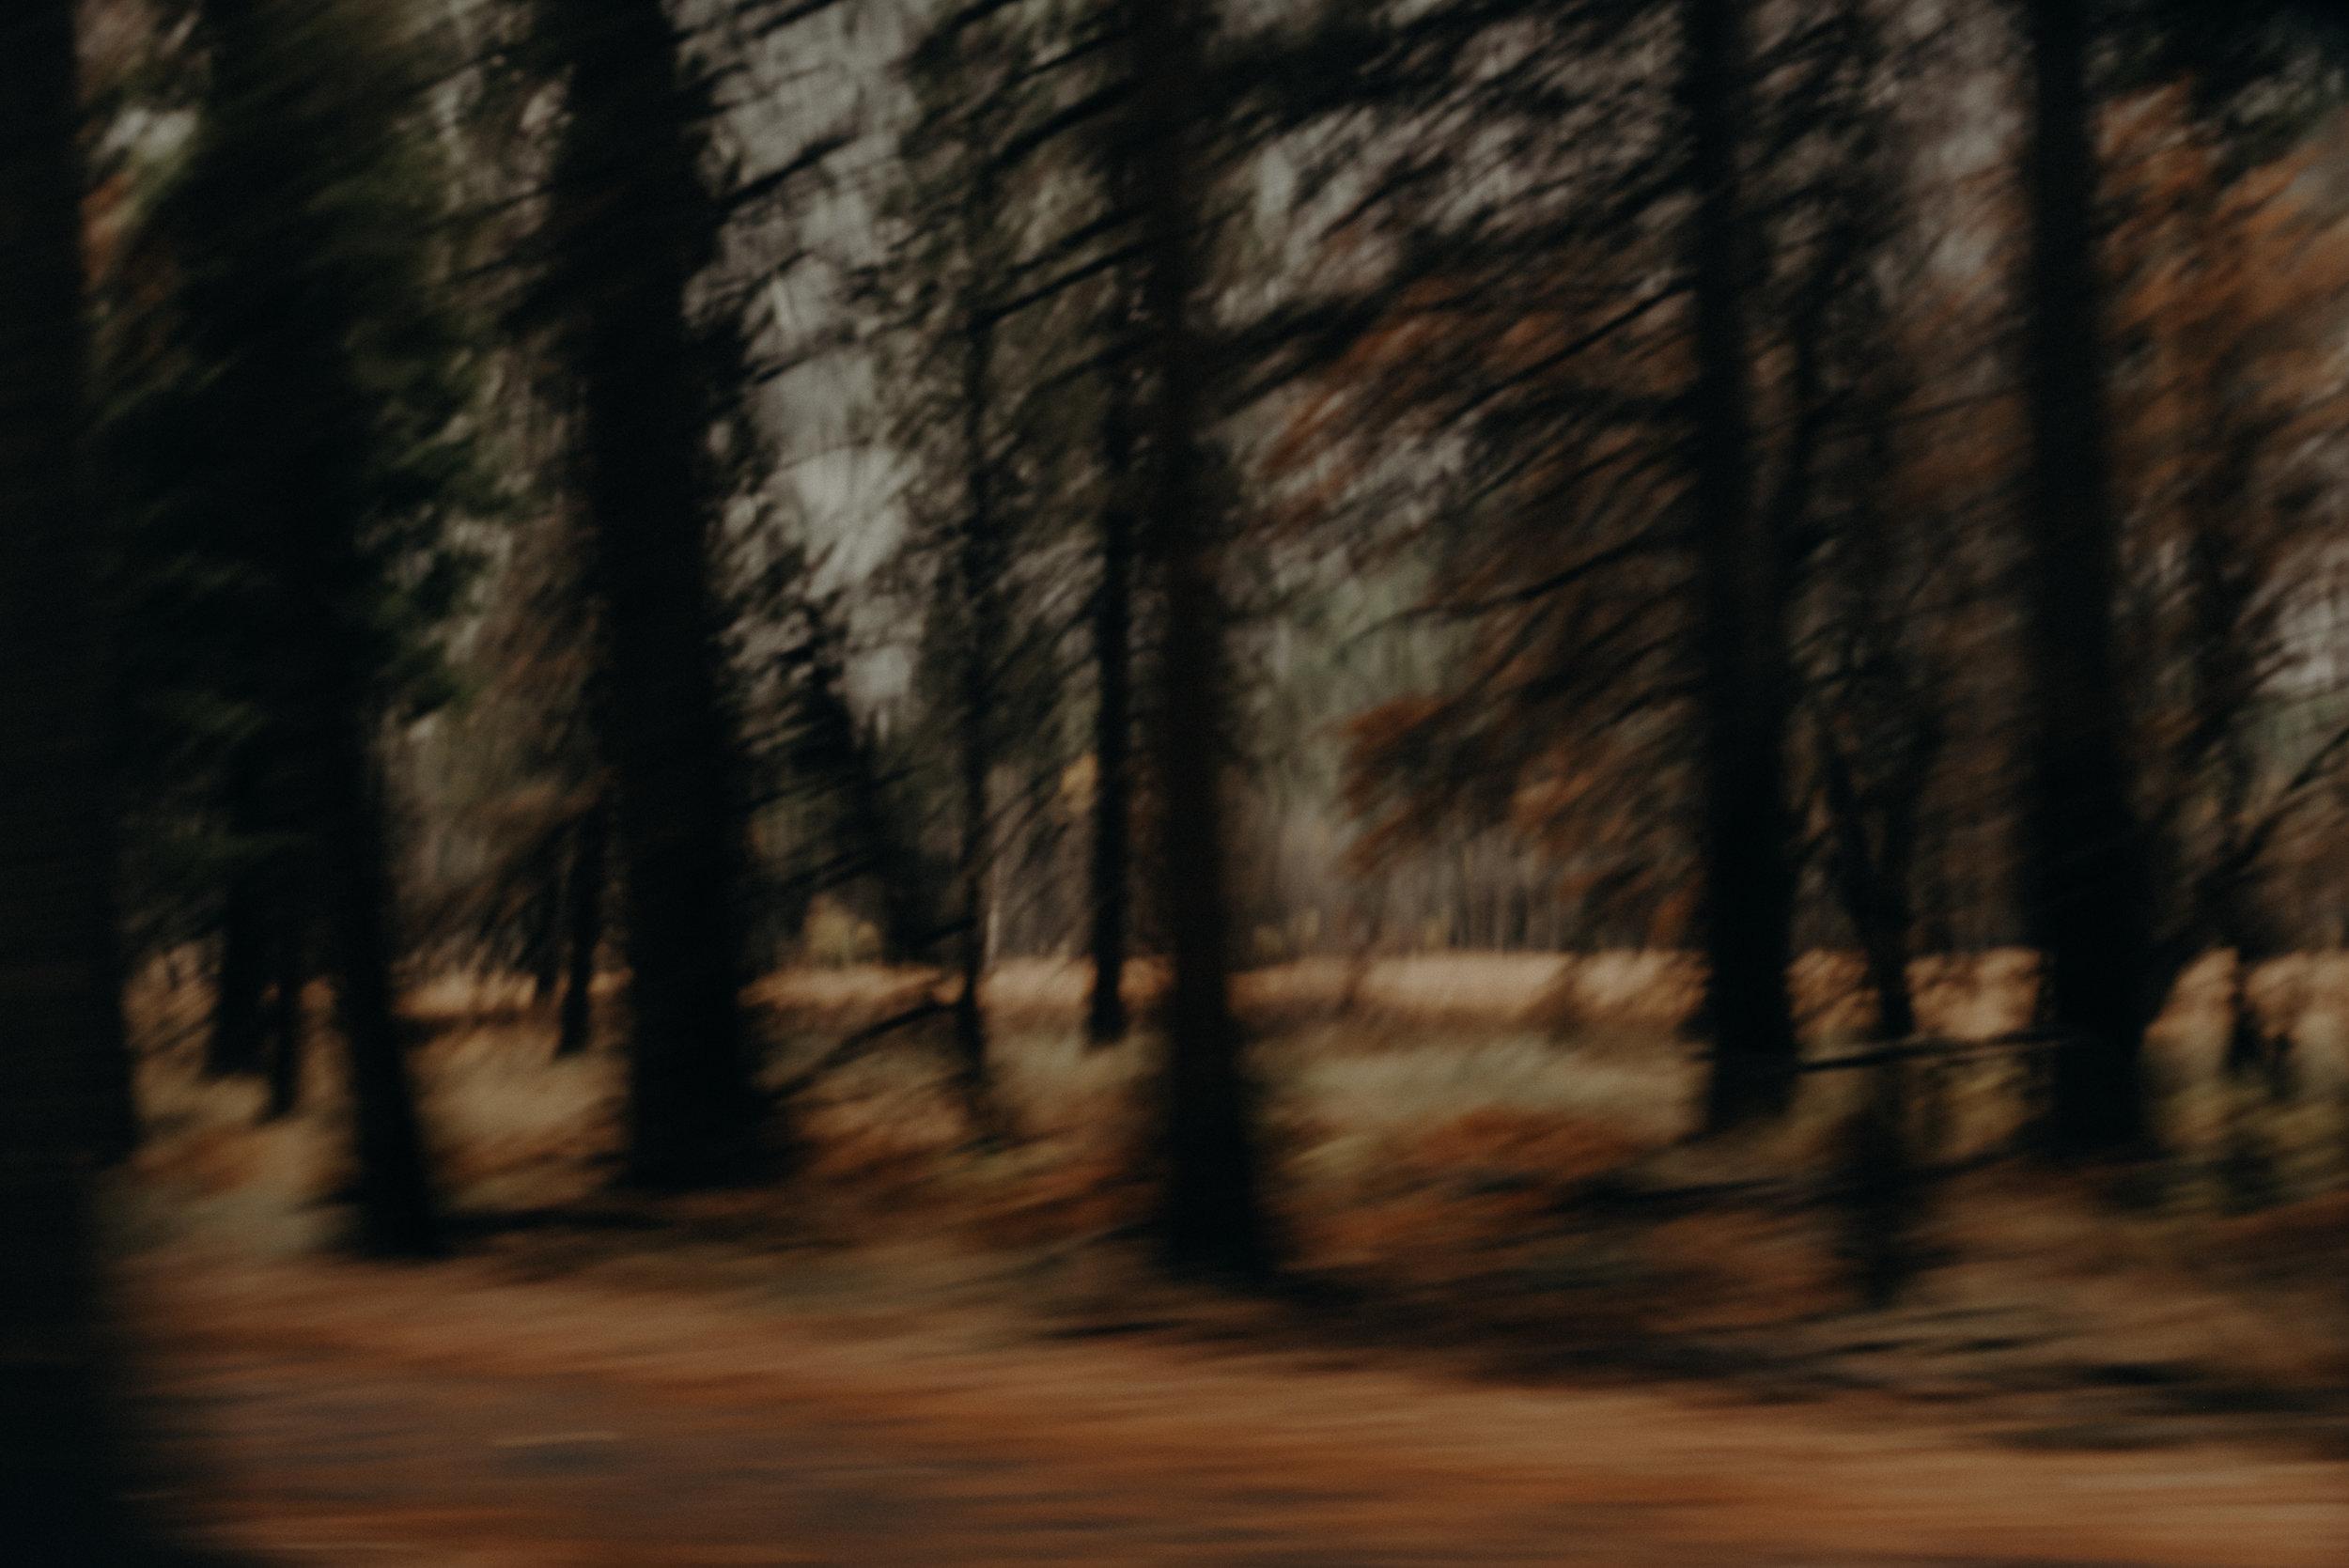 Isaiah + Taylor Photography - Yosemite Elopement - Los Angeles Wedding Photographer-2.jpg